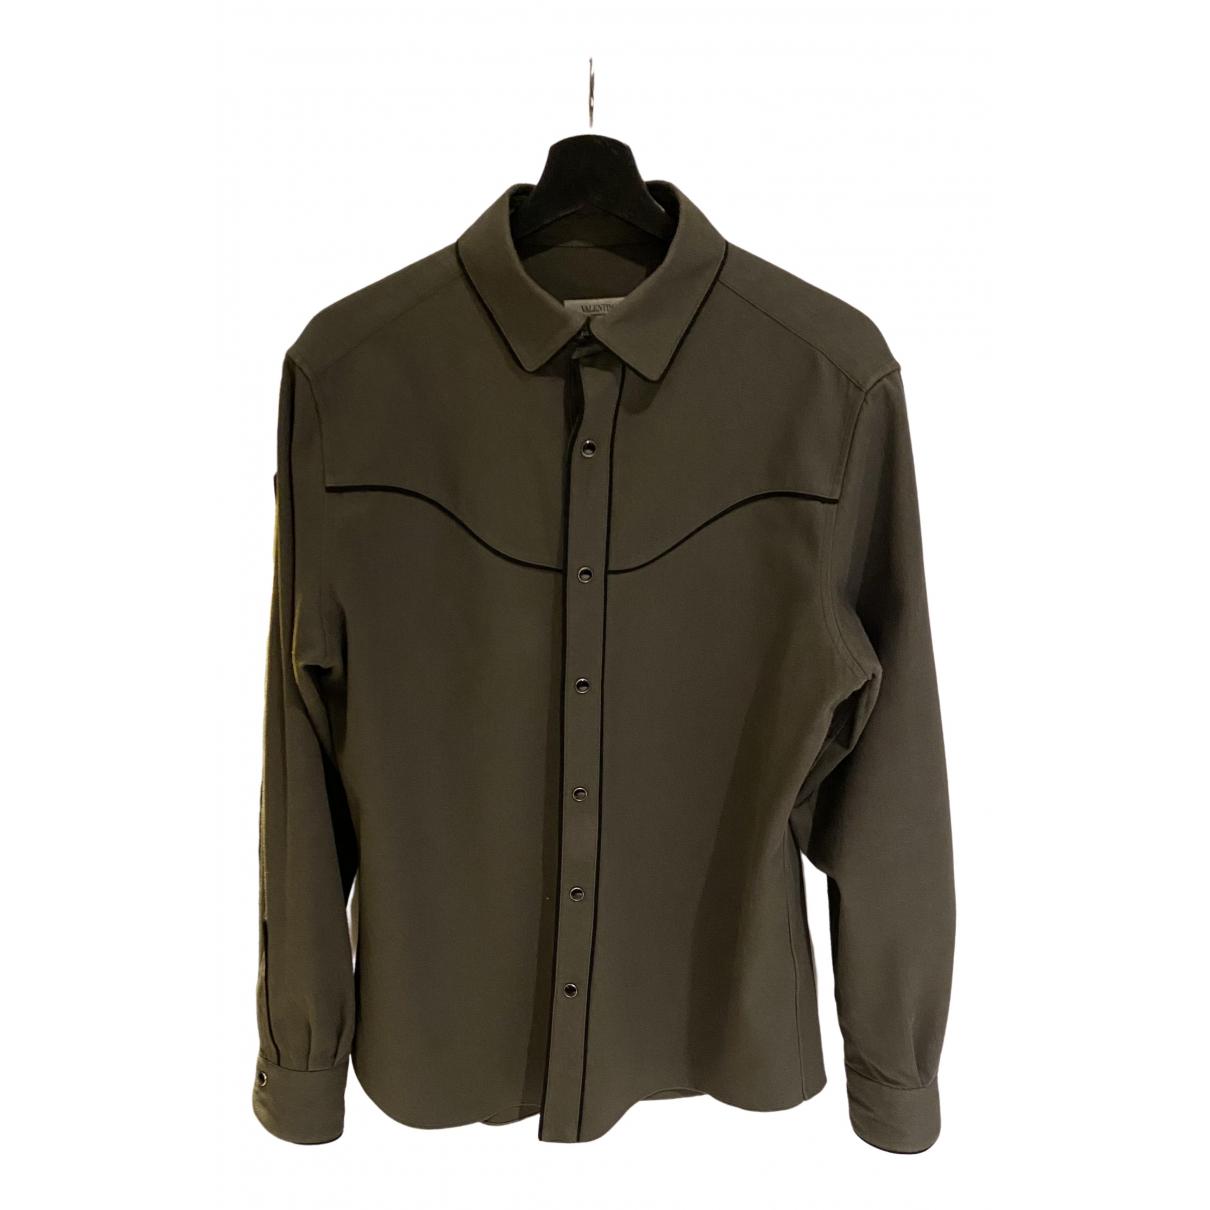 Valentino Garavani \N Khaki Cotton Shirts for Men 41 EU (tour de cou / collar)